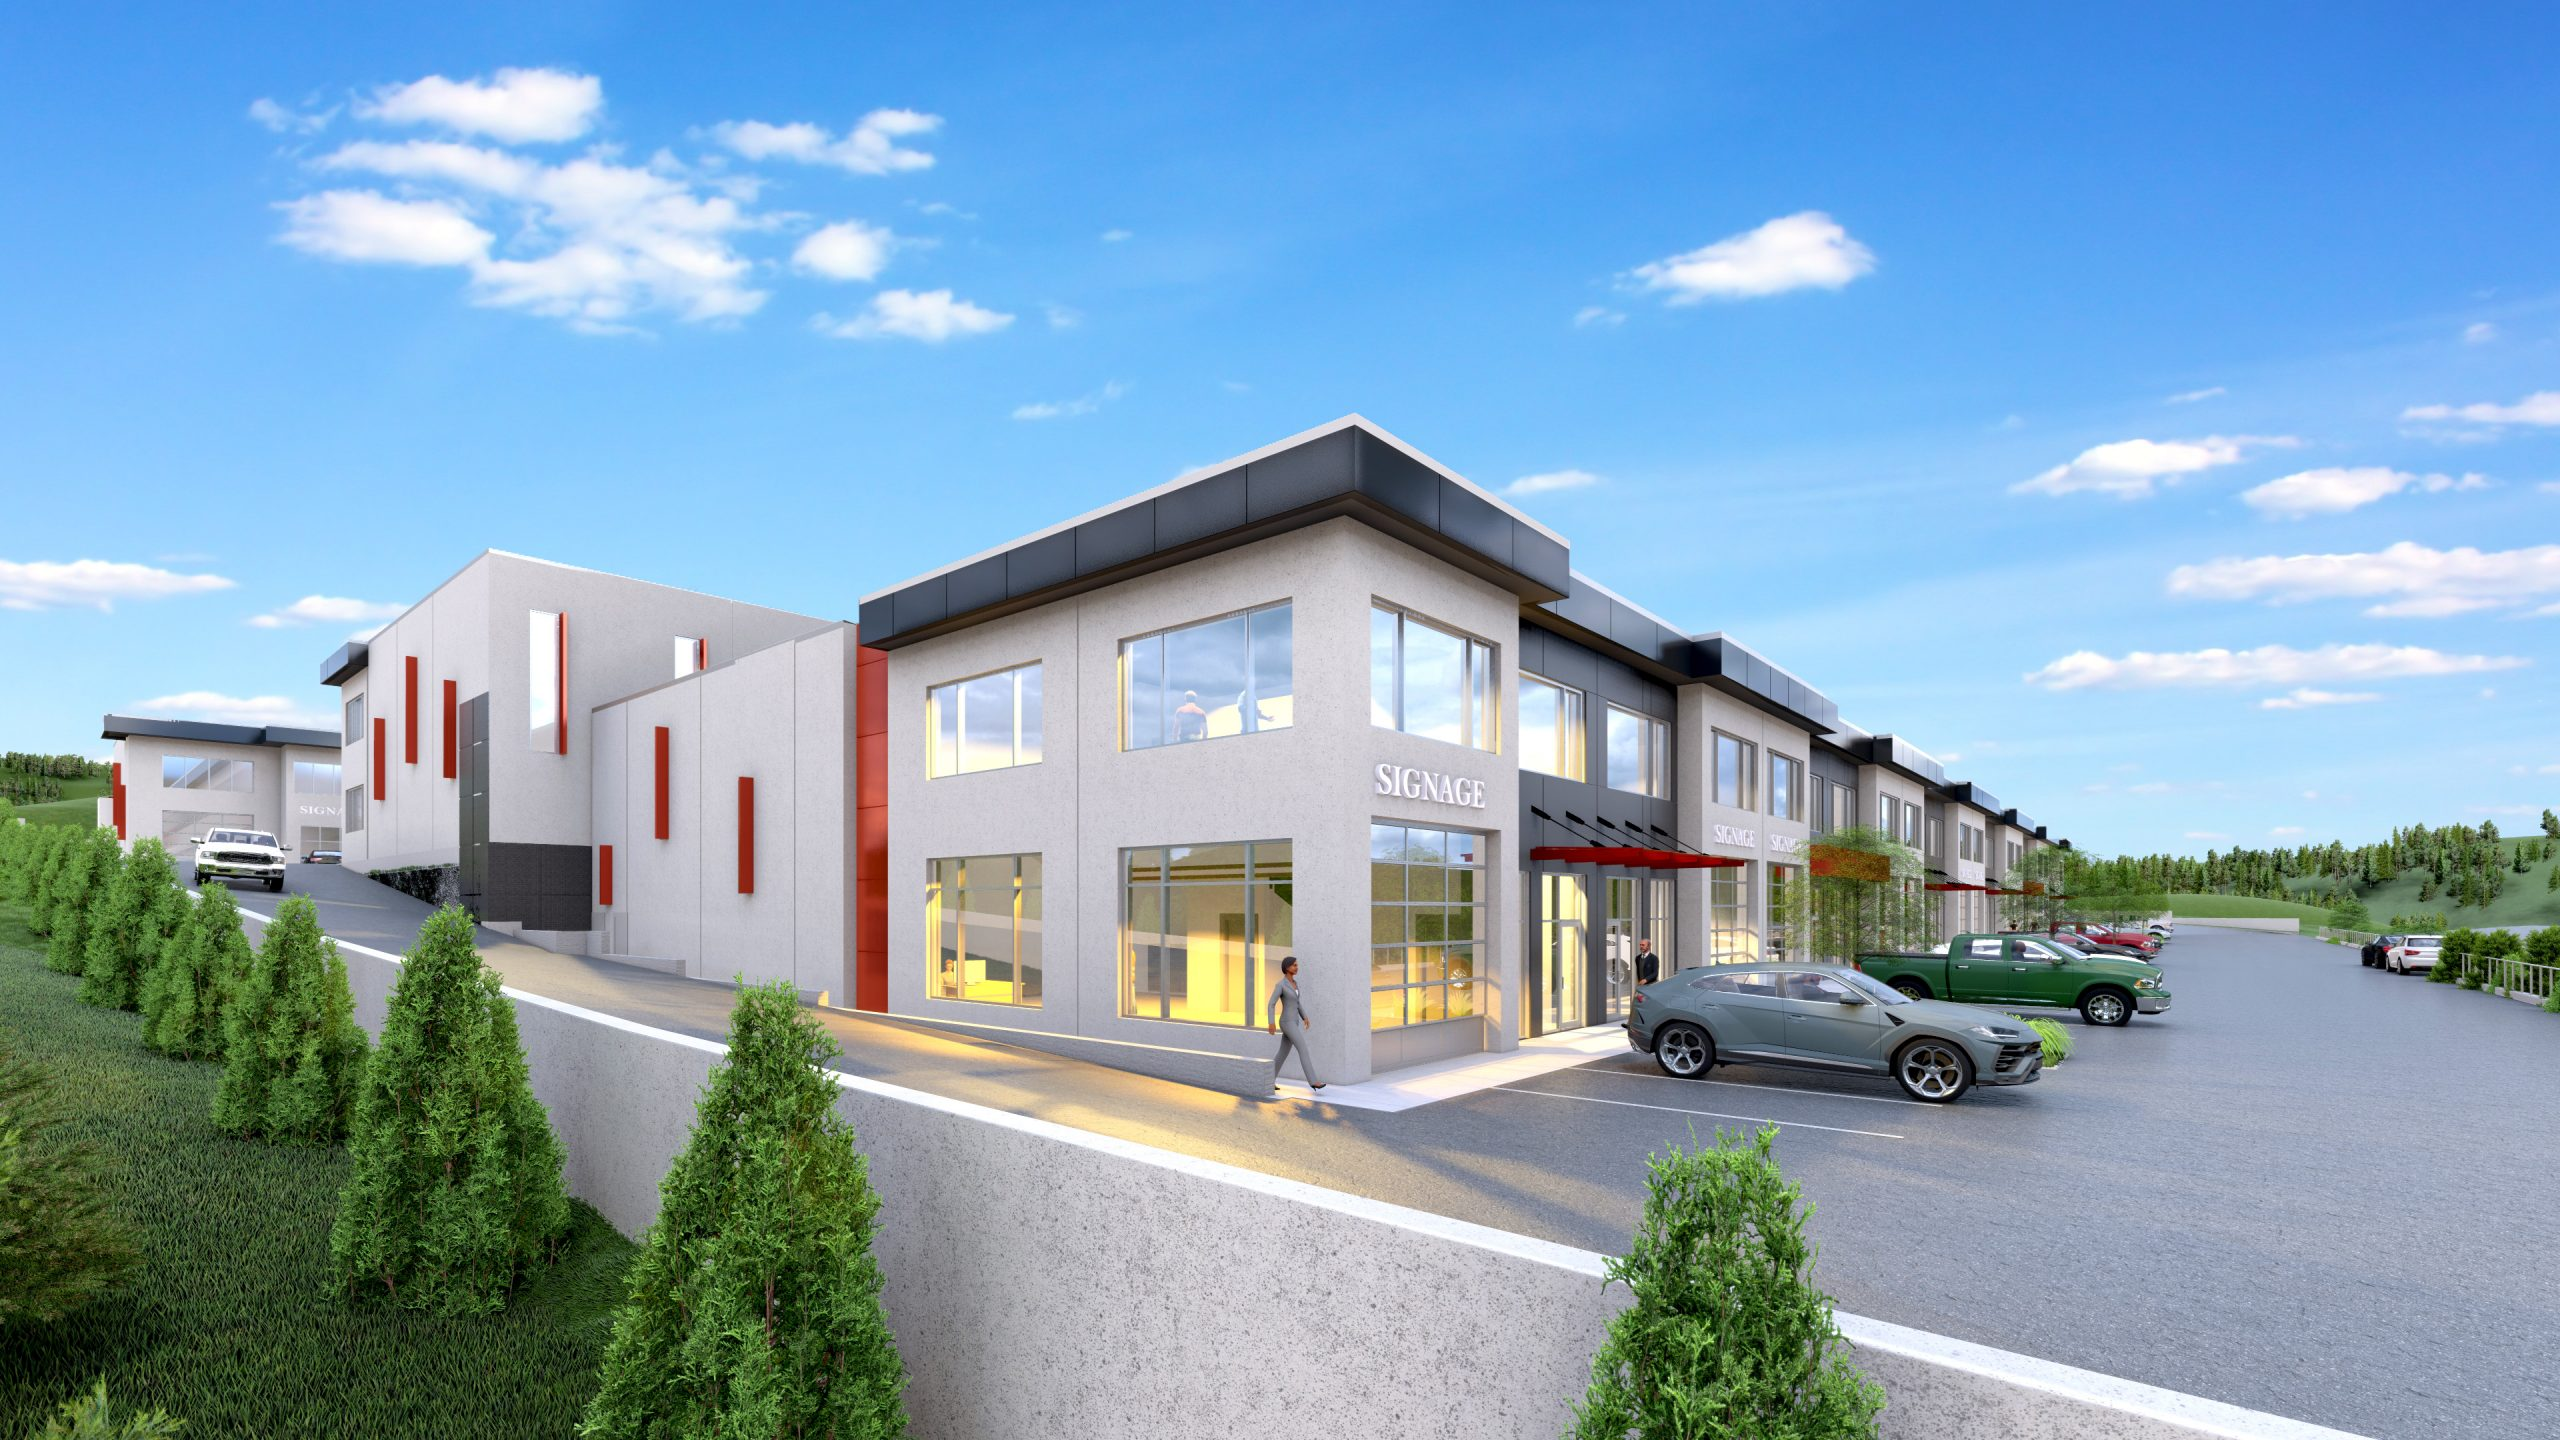 Lot 360-32 Carrington Road, West Kelowna, BC - Carrington Industrial Park